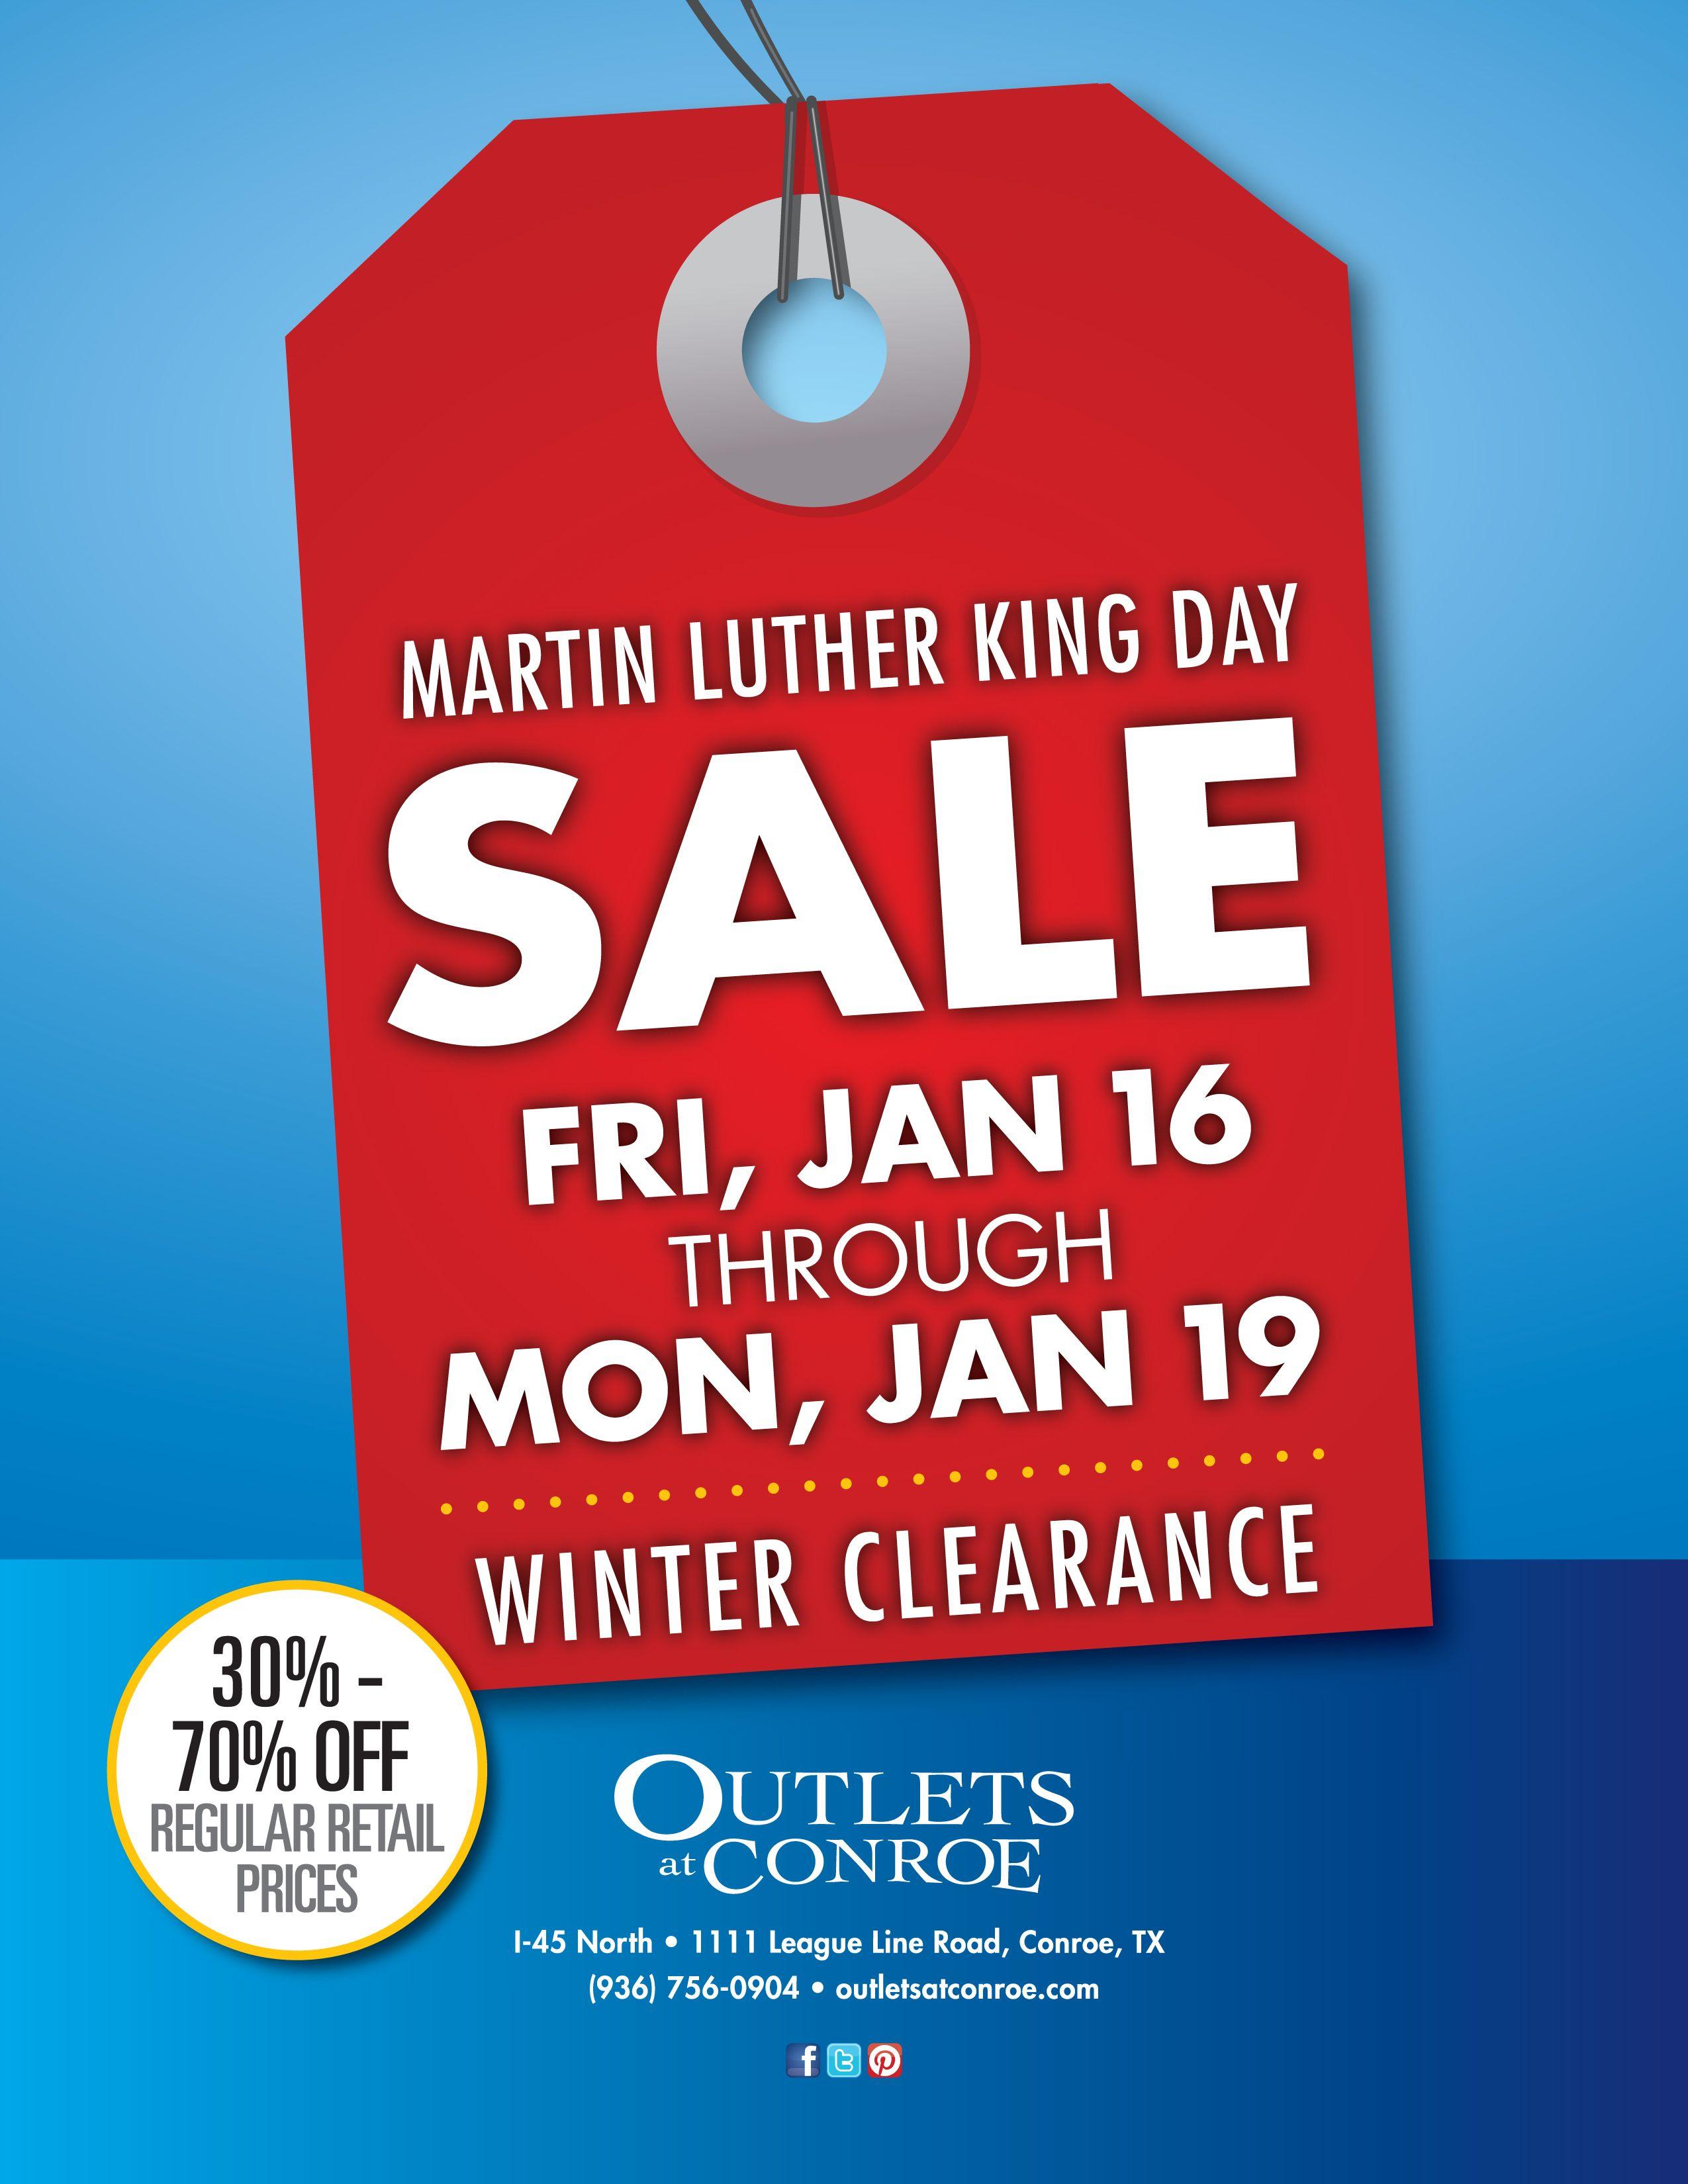 Martin Luther King Jr. Day Weekend Sale. Jan. 16 - Jan. 19 ...